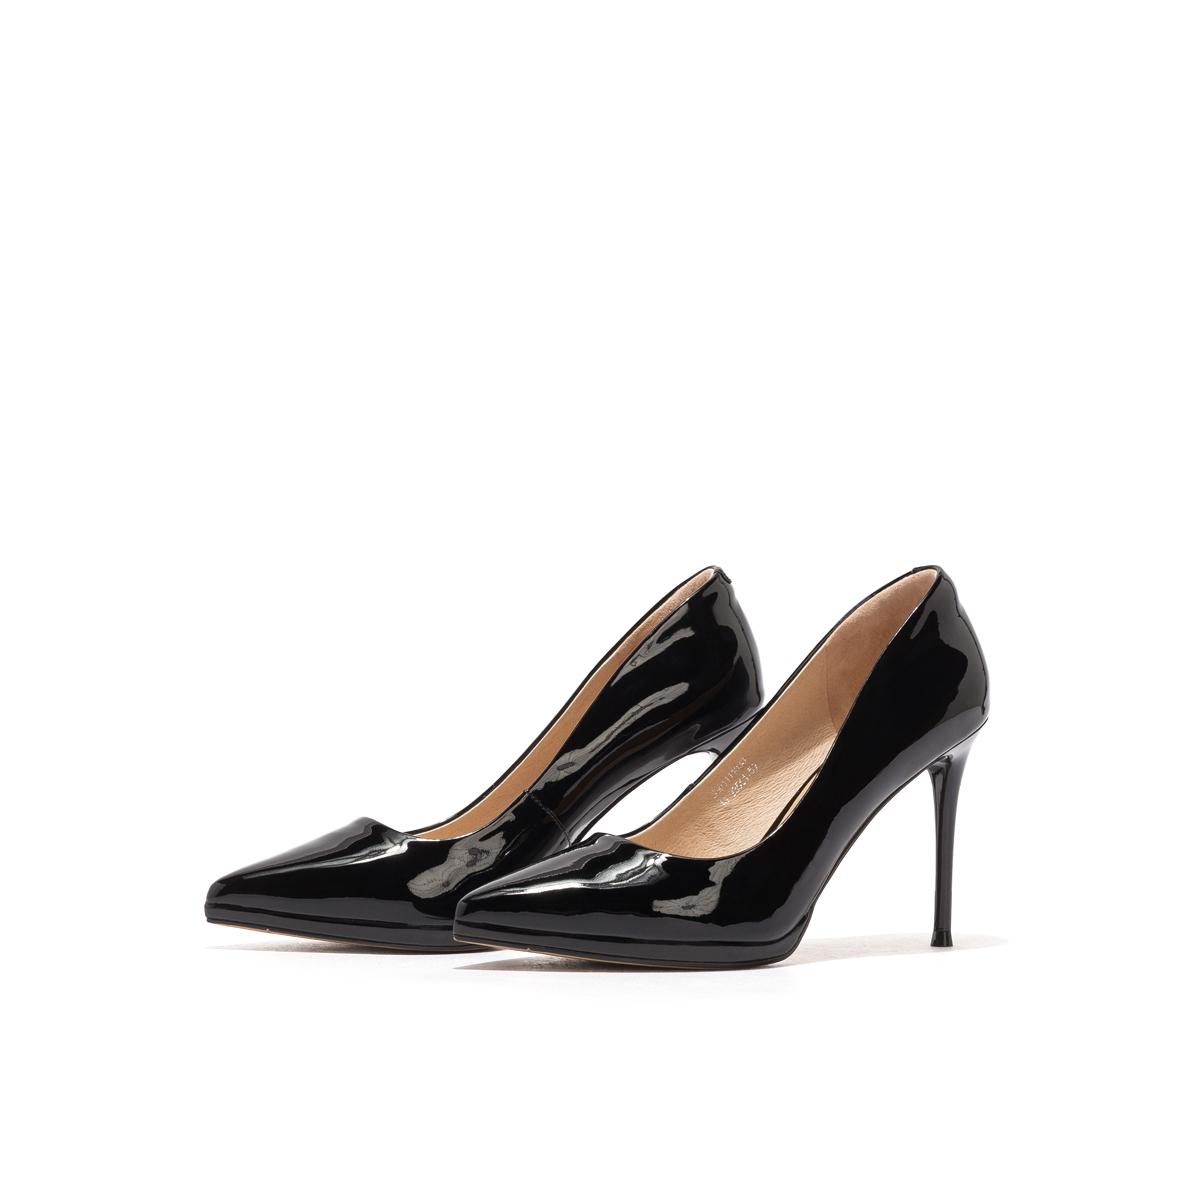 SS01111033 春季新款欧美风细高跟浅口单鞋女鞋 2020 星期六 Sat & St